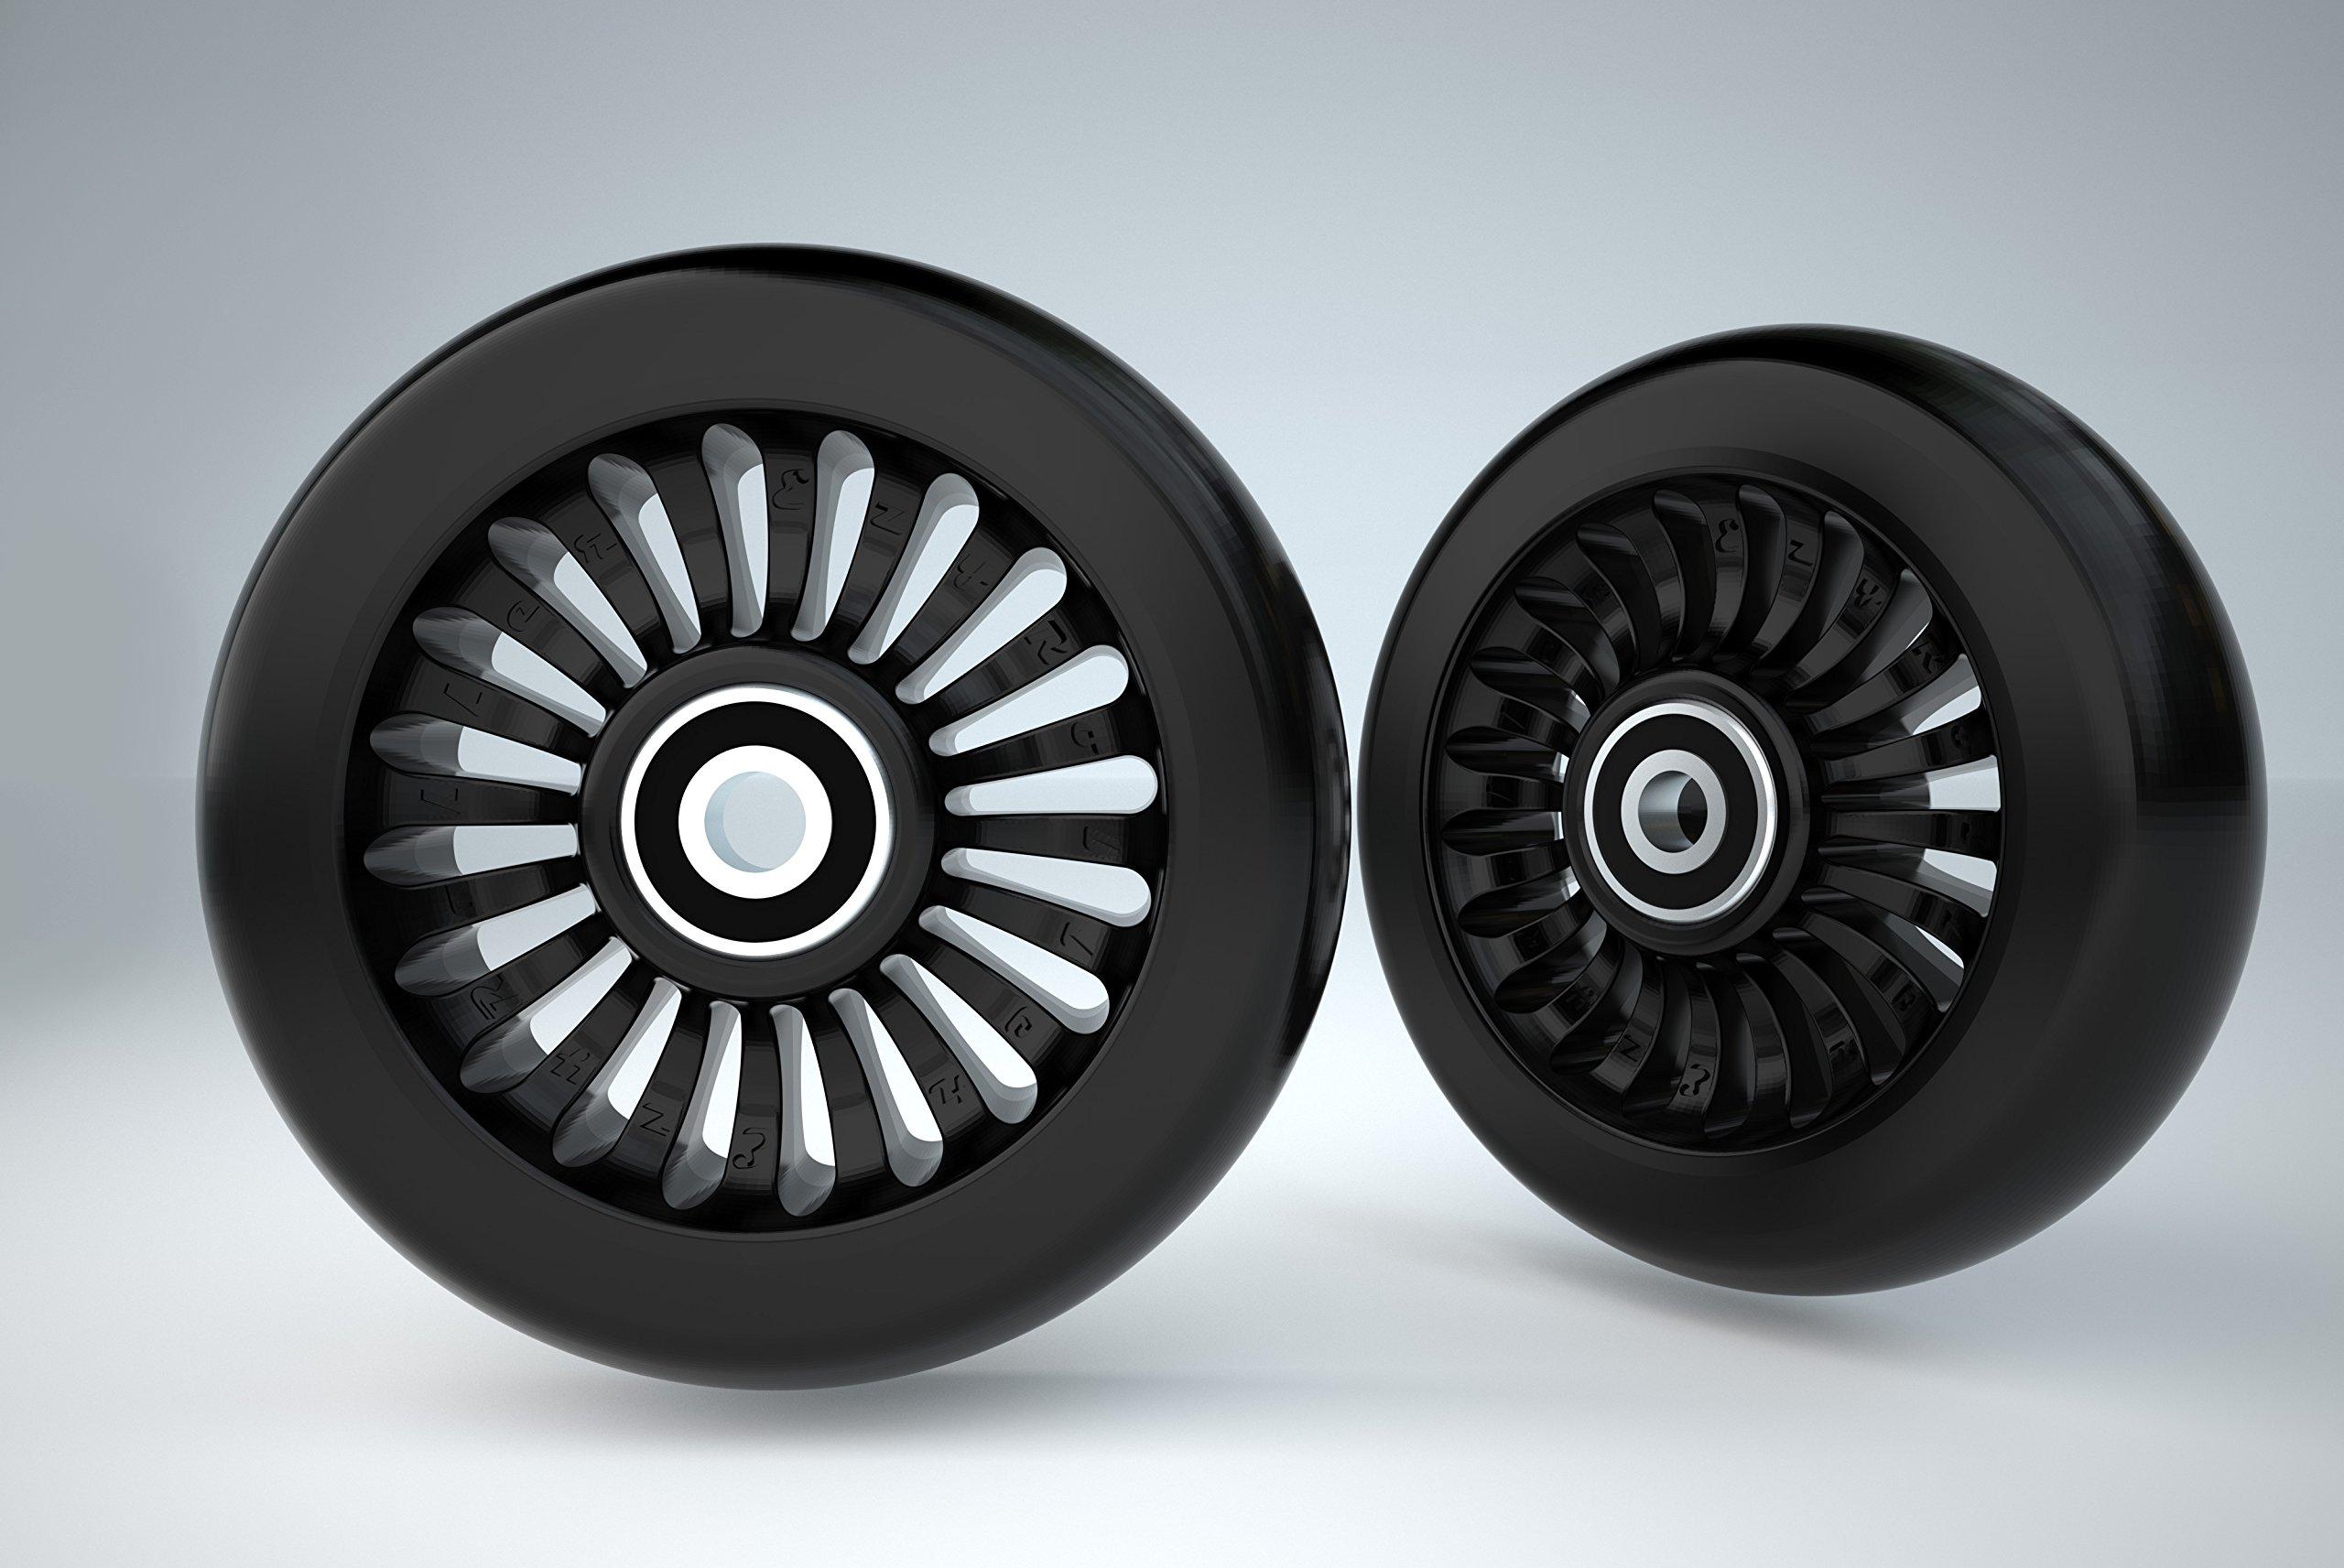 EzyRoller Replacements Wheels, Set of 2 by EzyRoller